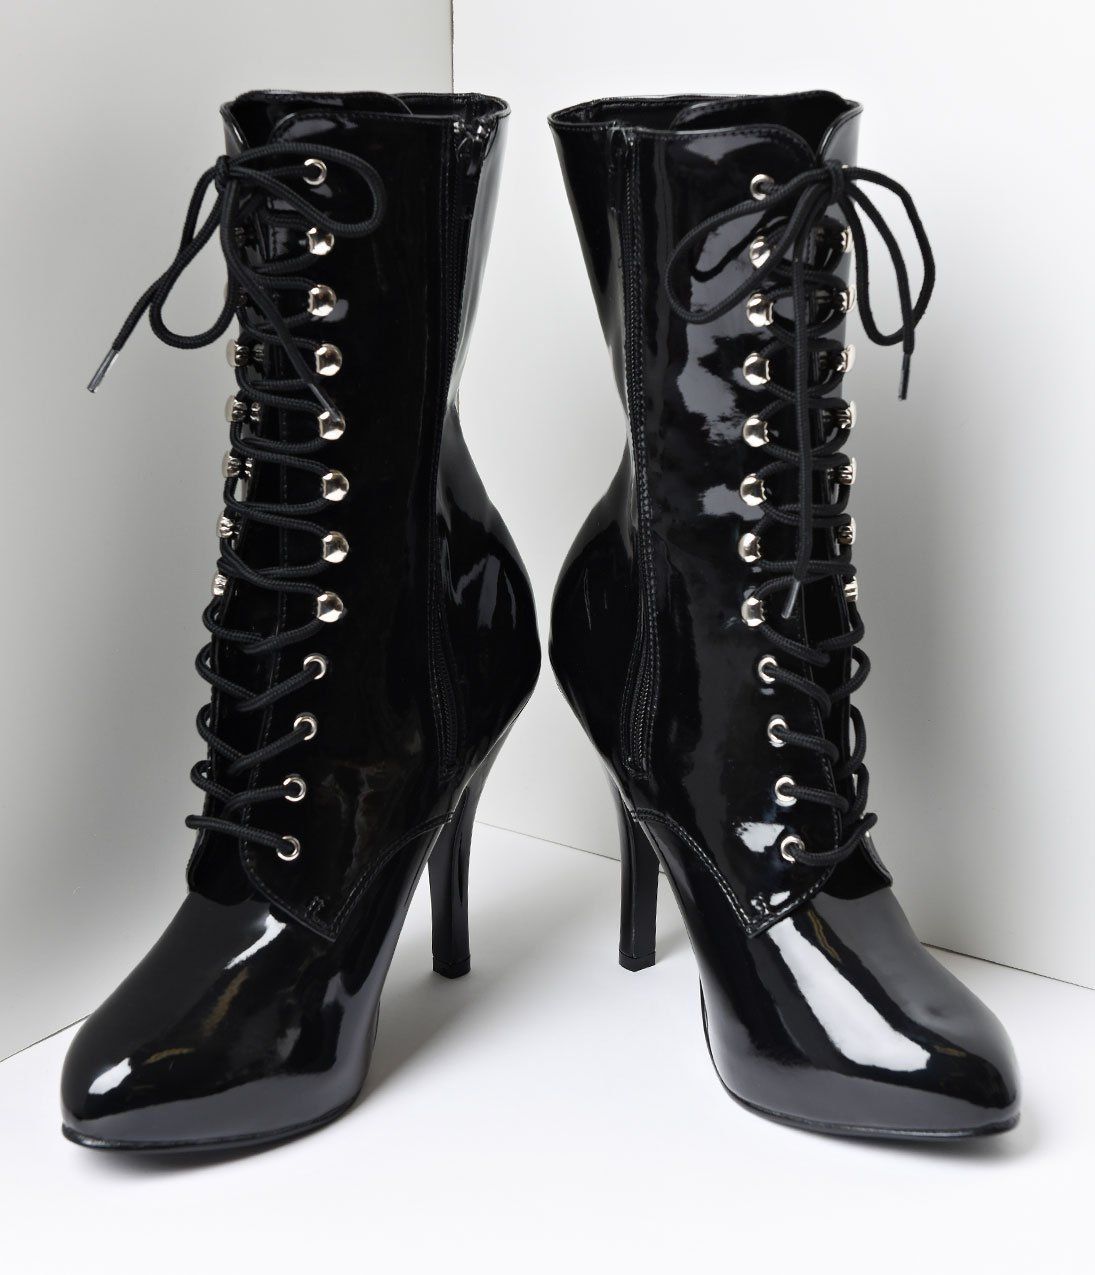 Black Patent Leather Lace Up Stiletto